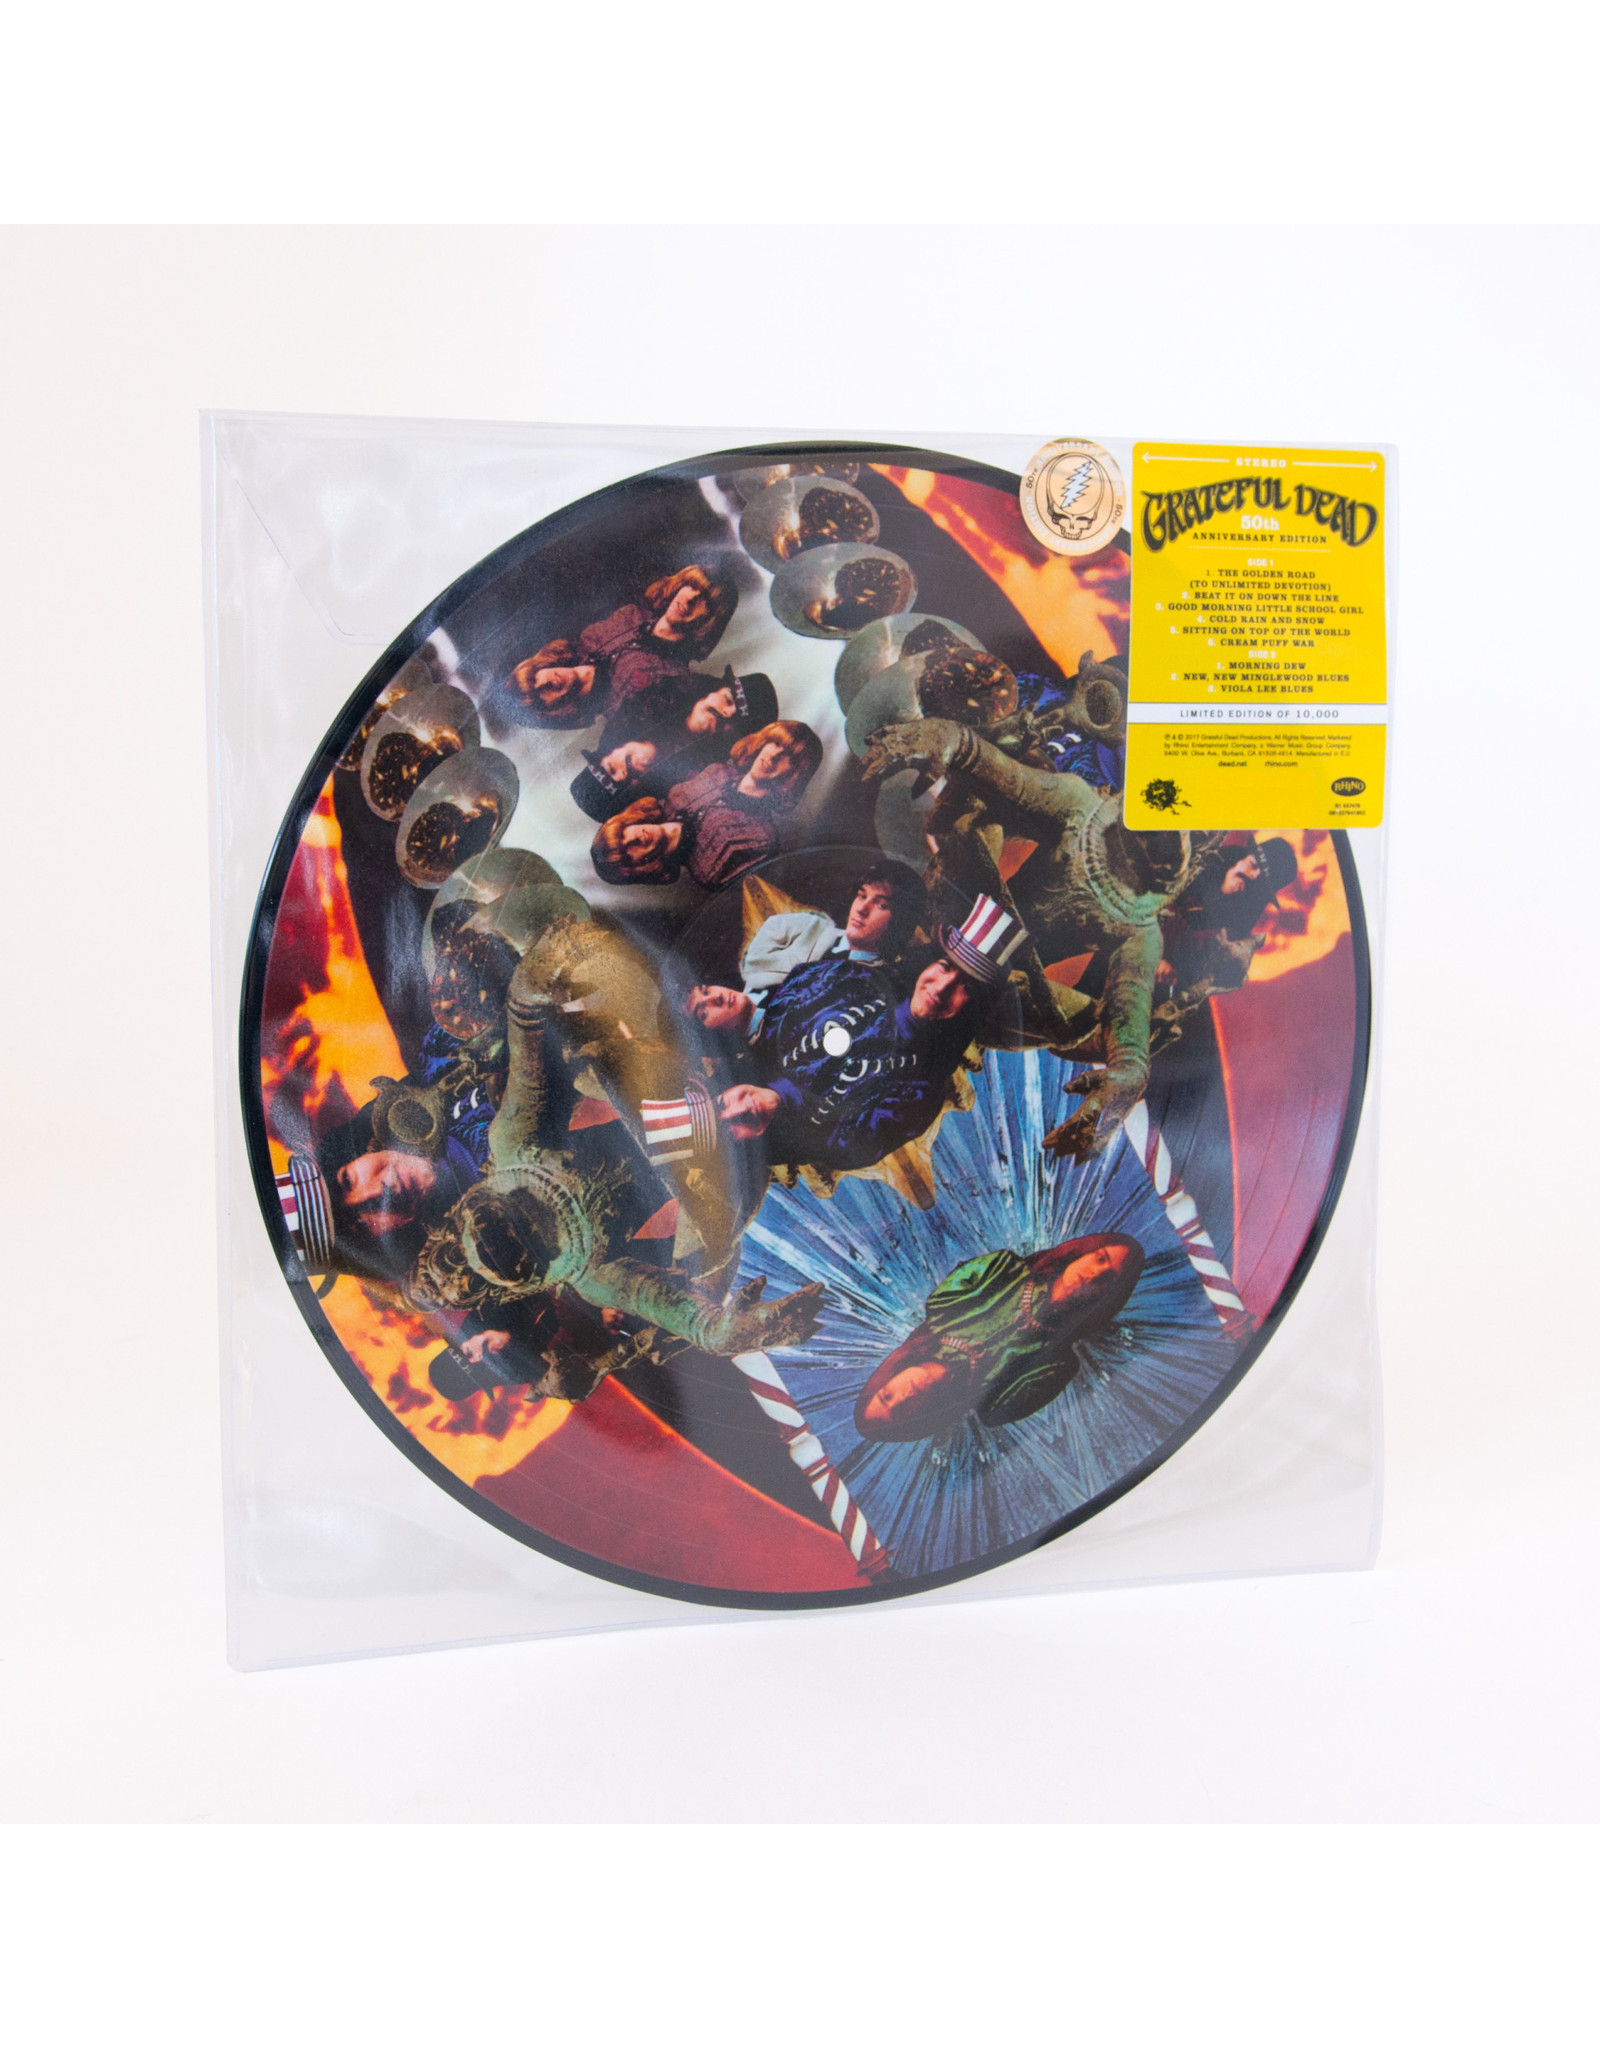 Grateful Dead - Grateful Dead (50th Ann. Dlx Ed. Pic Disc)